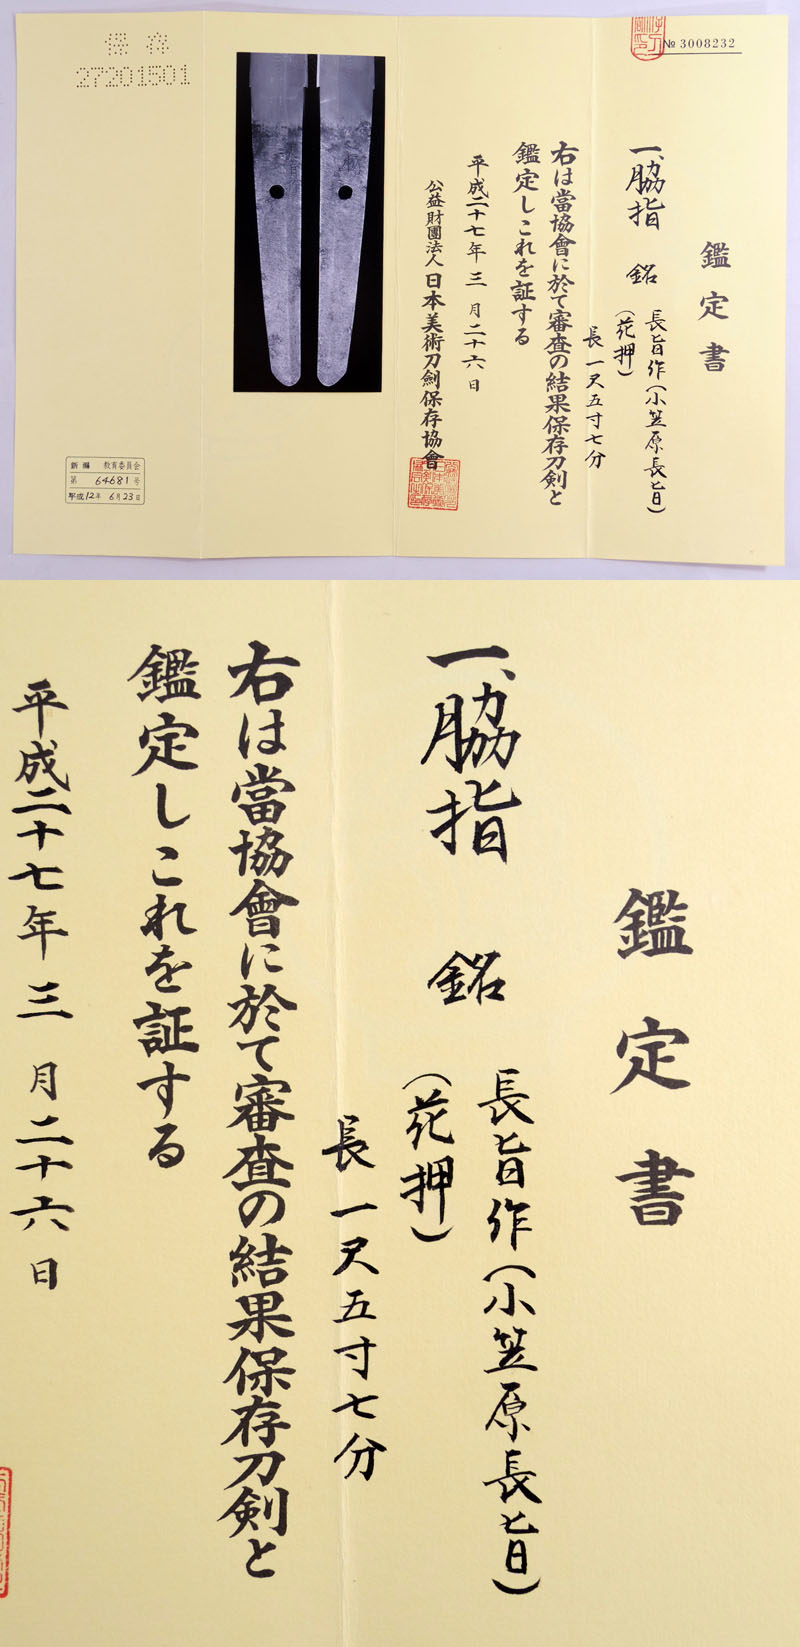 長旨(小笠原長旨) Picture of Certificate